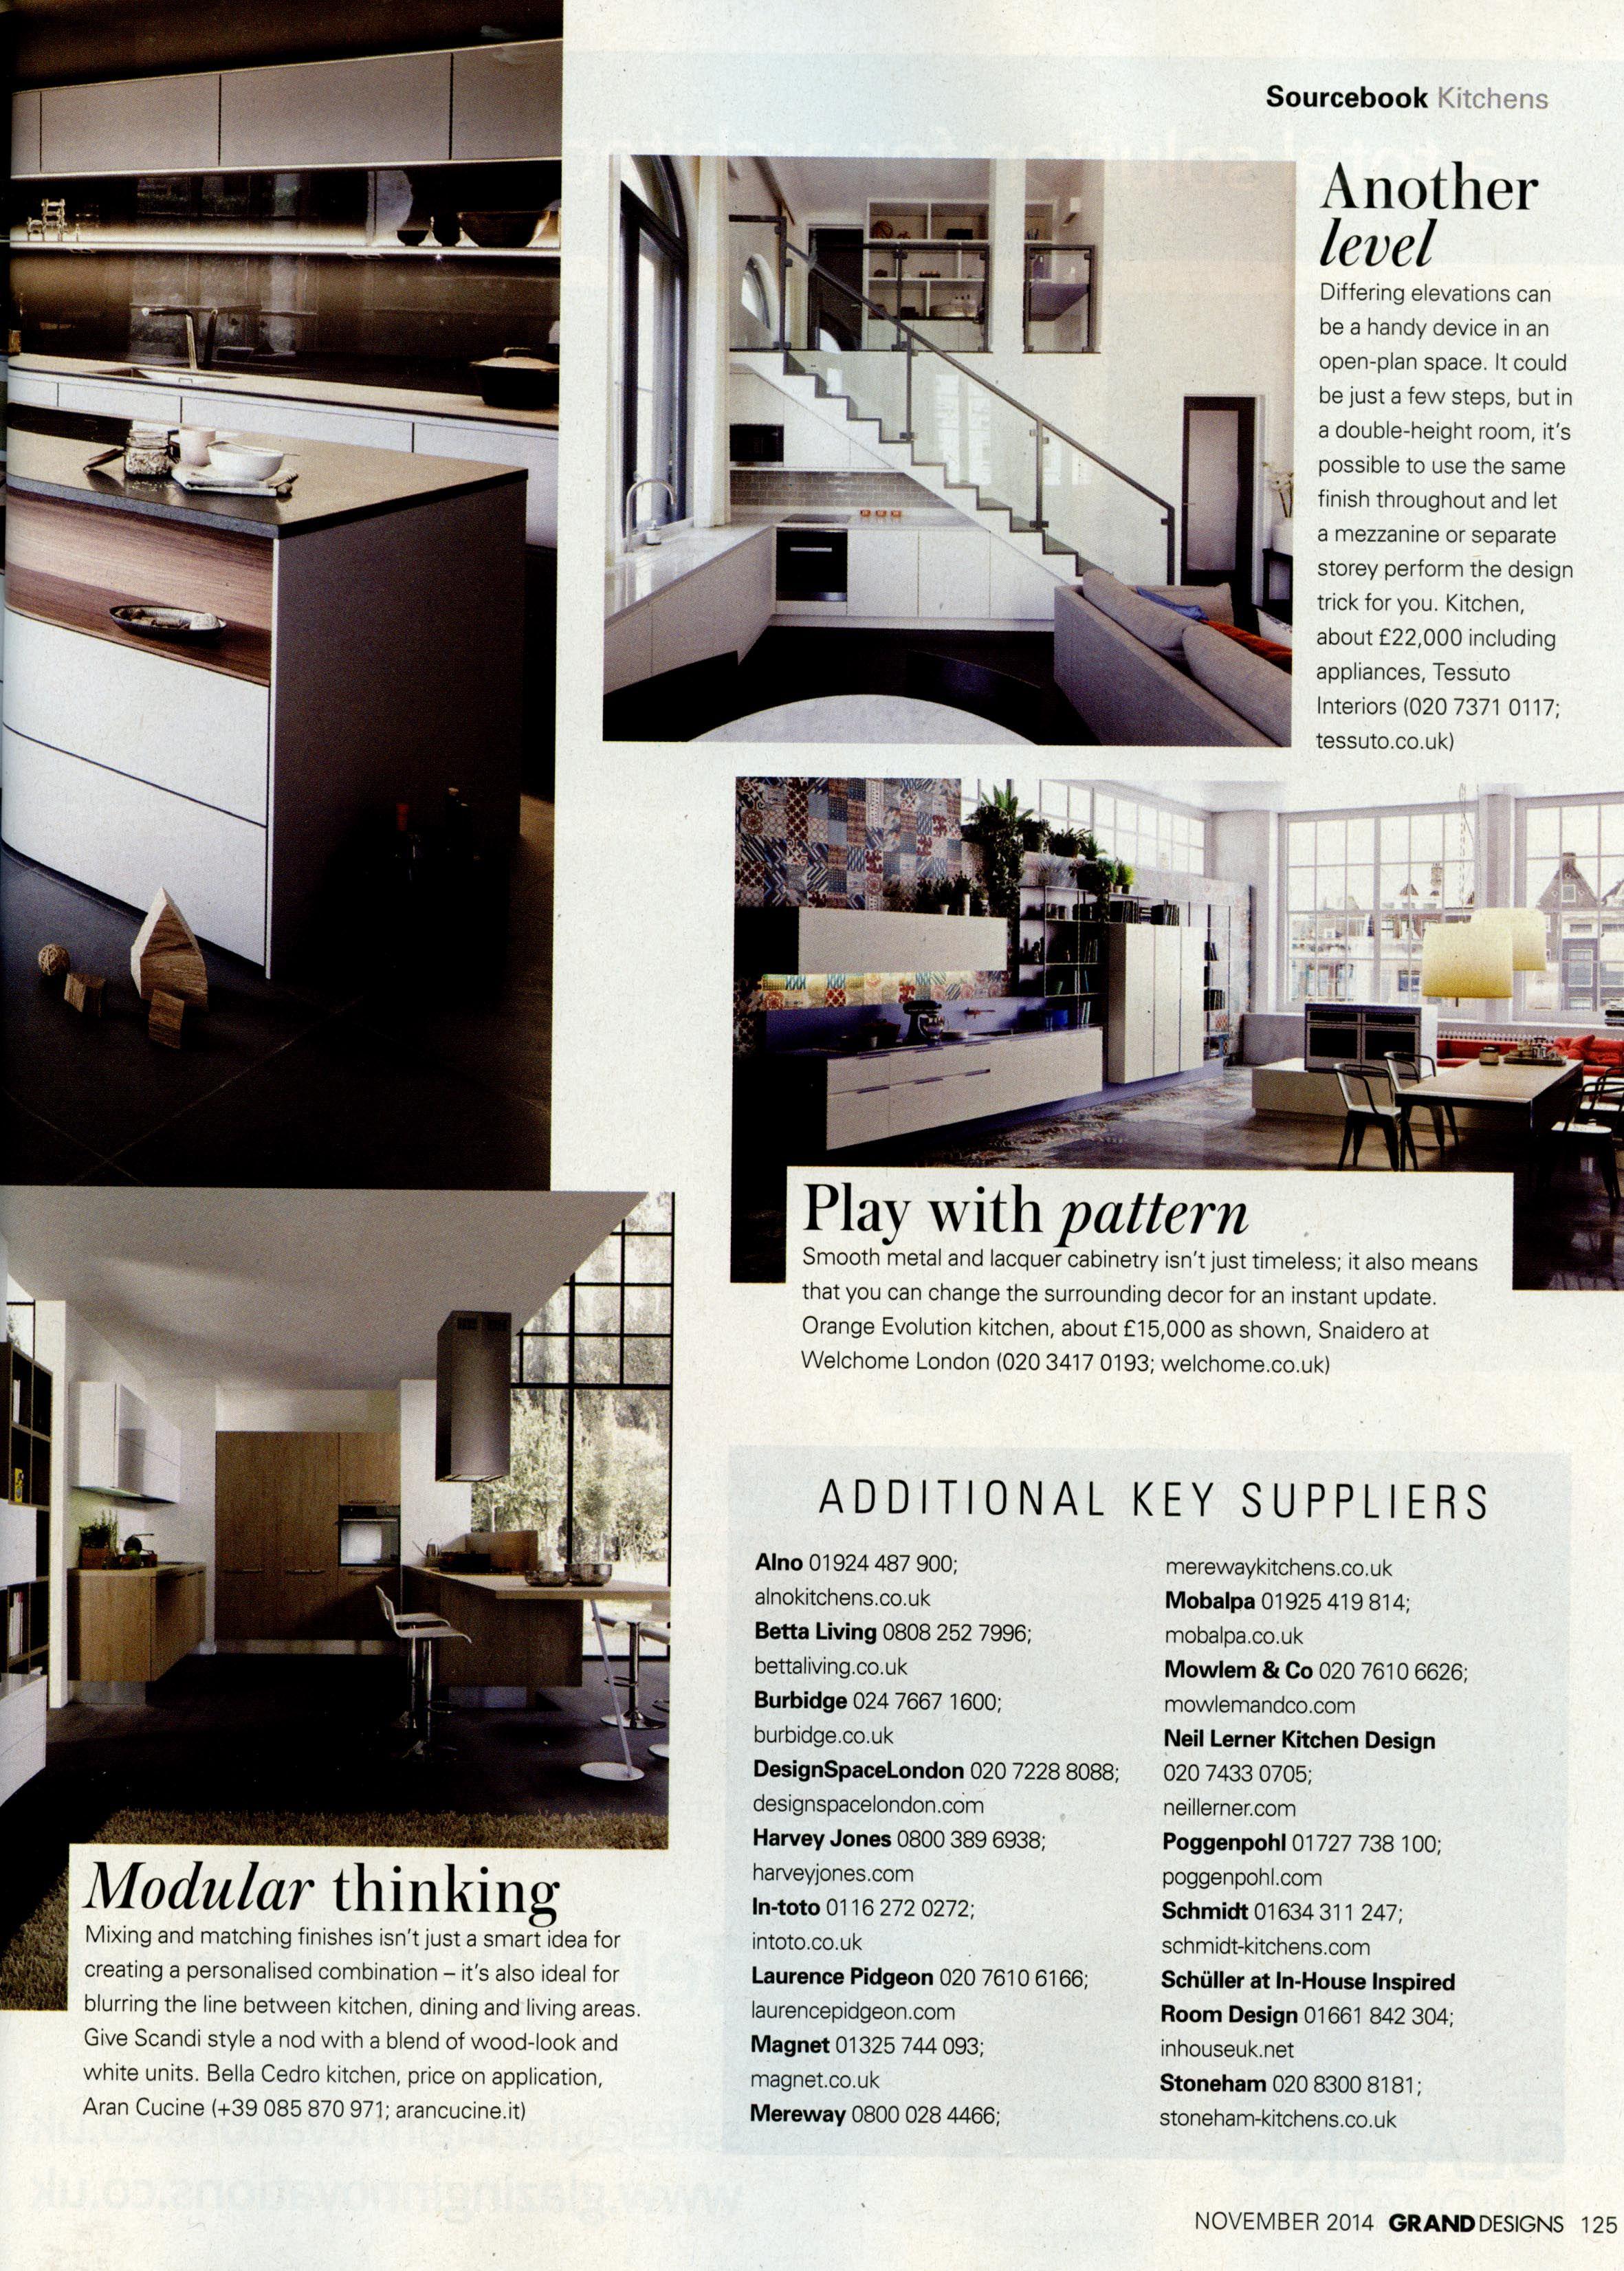 Key kitchen suppliers: DesignSpace London designspacelondon... Grand Designs November 2014